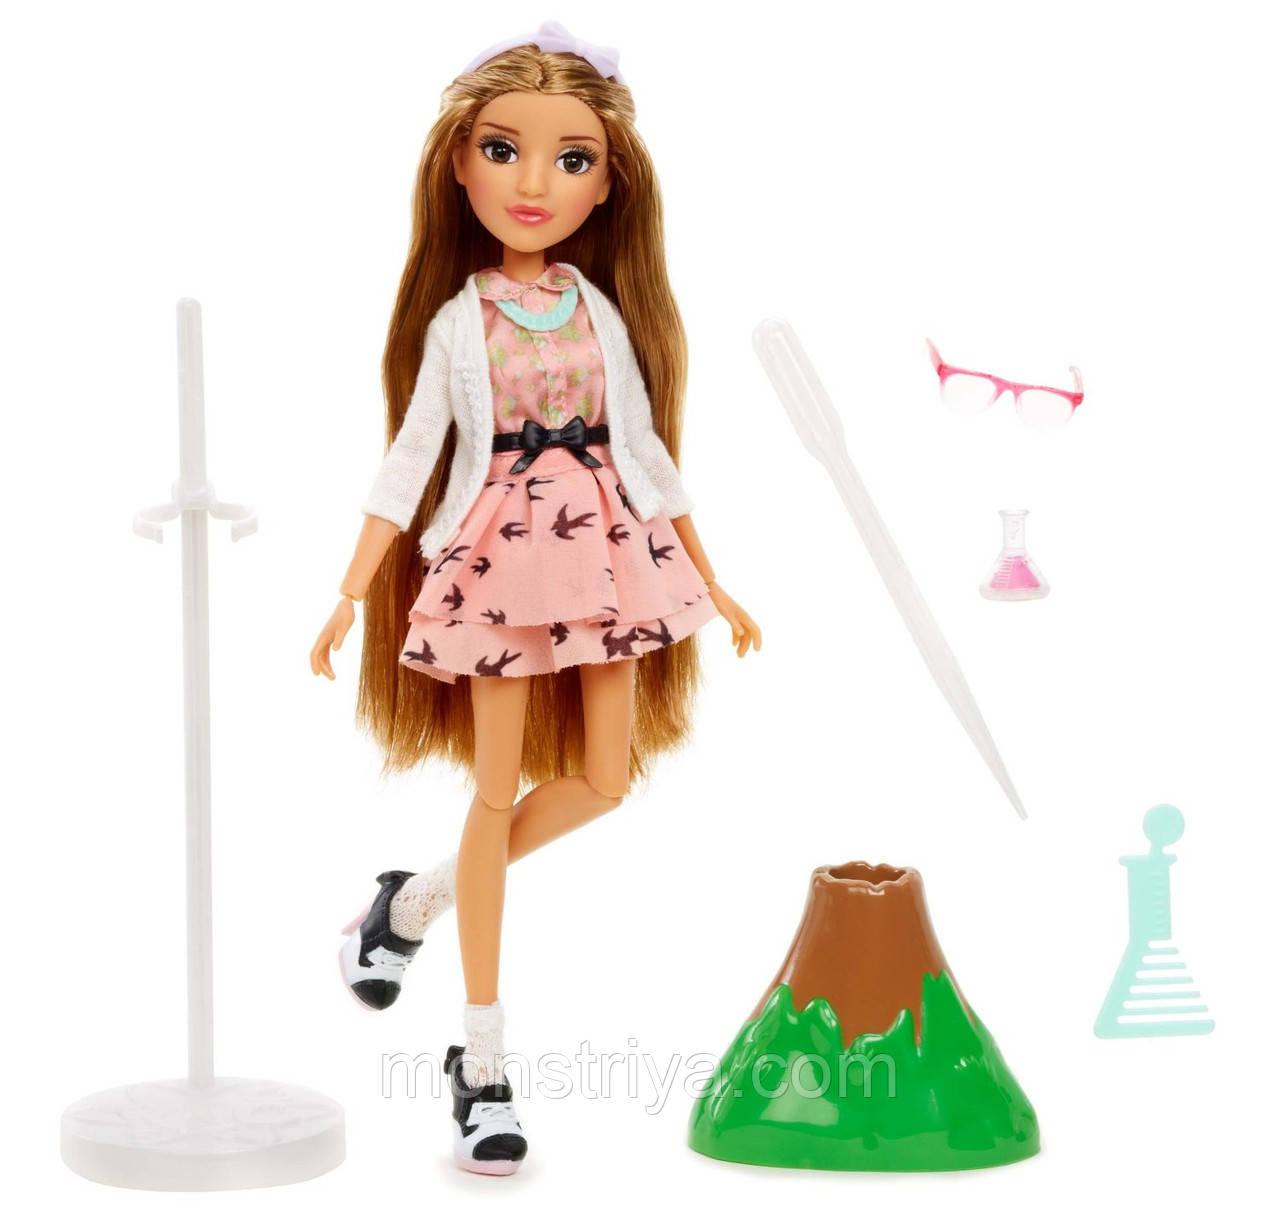 Кукла Адриенн (Адрианна) Атомс Проект Мс2 (Project Mc2)